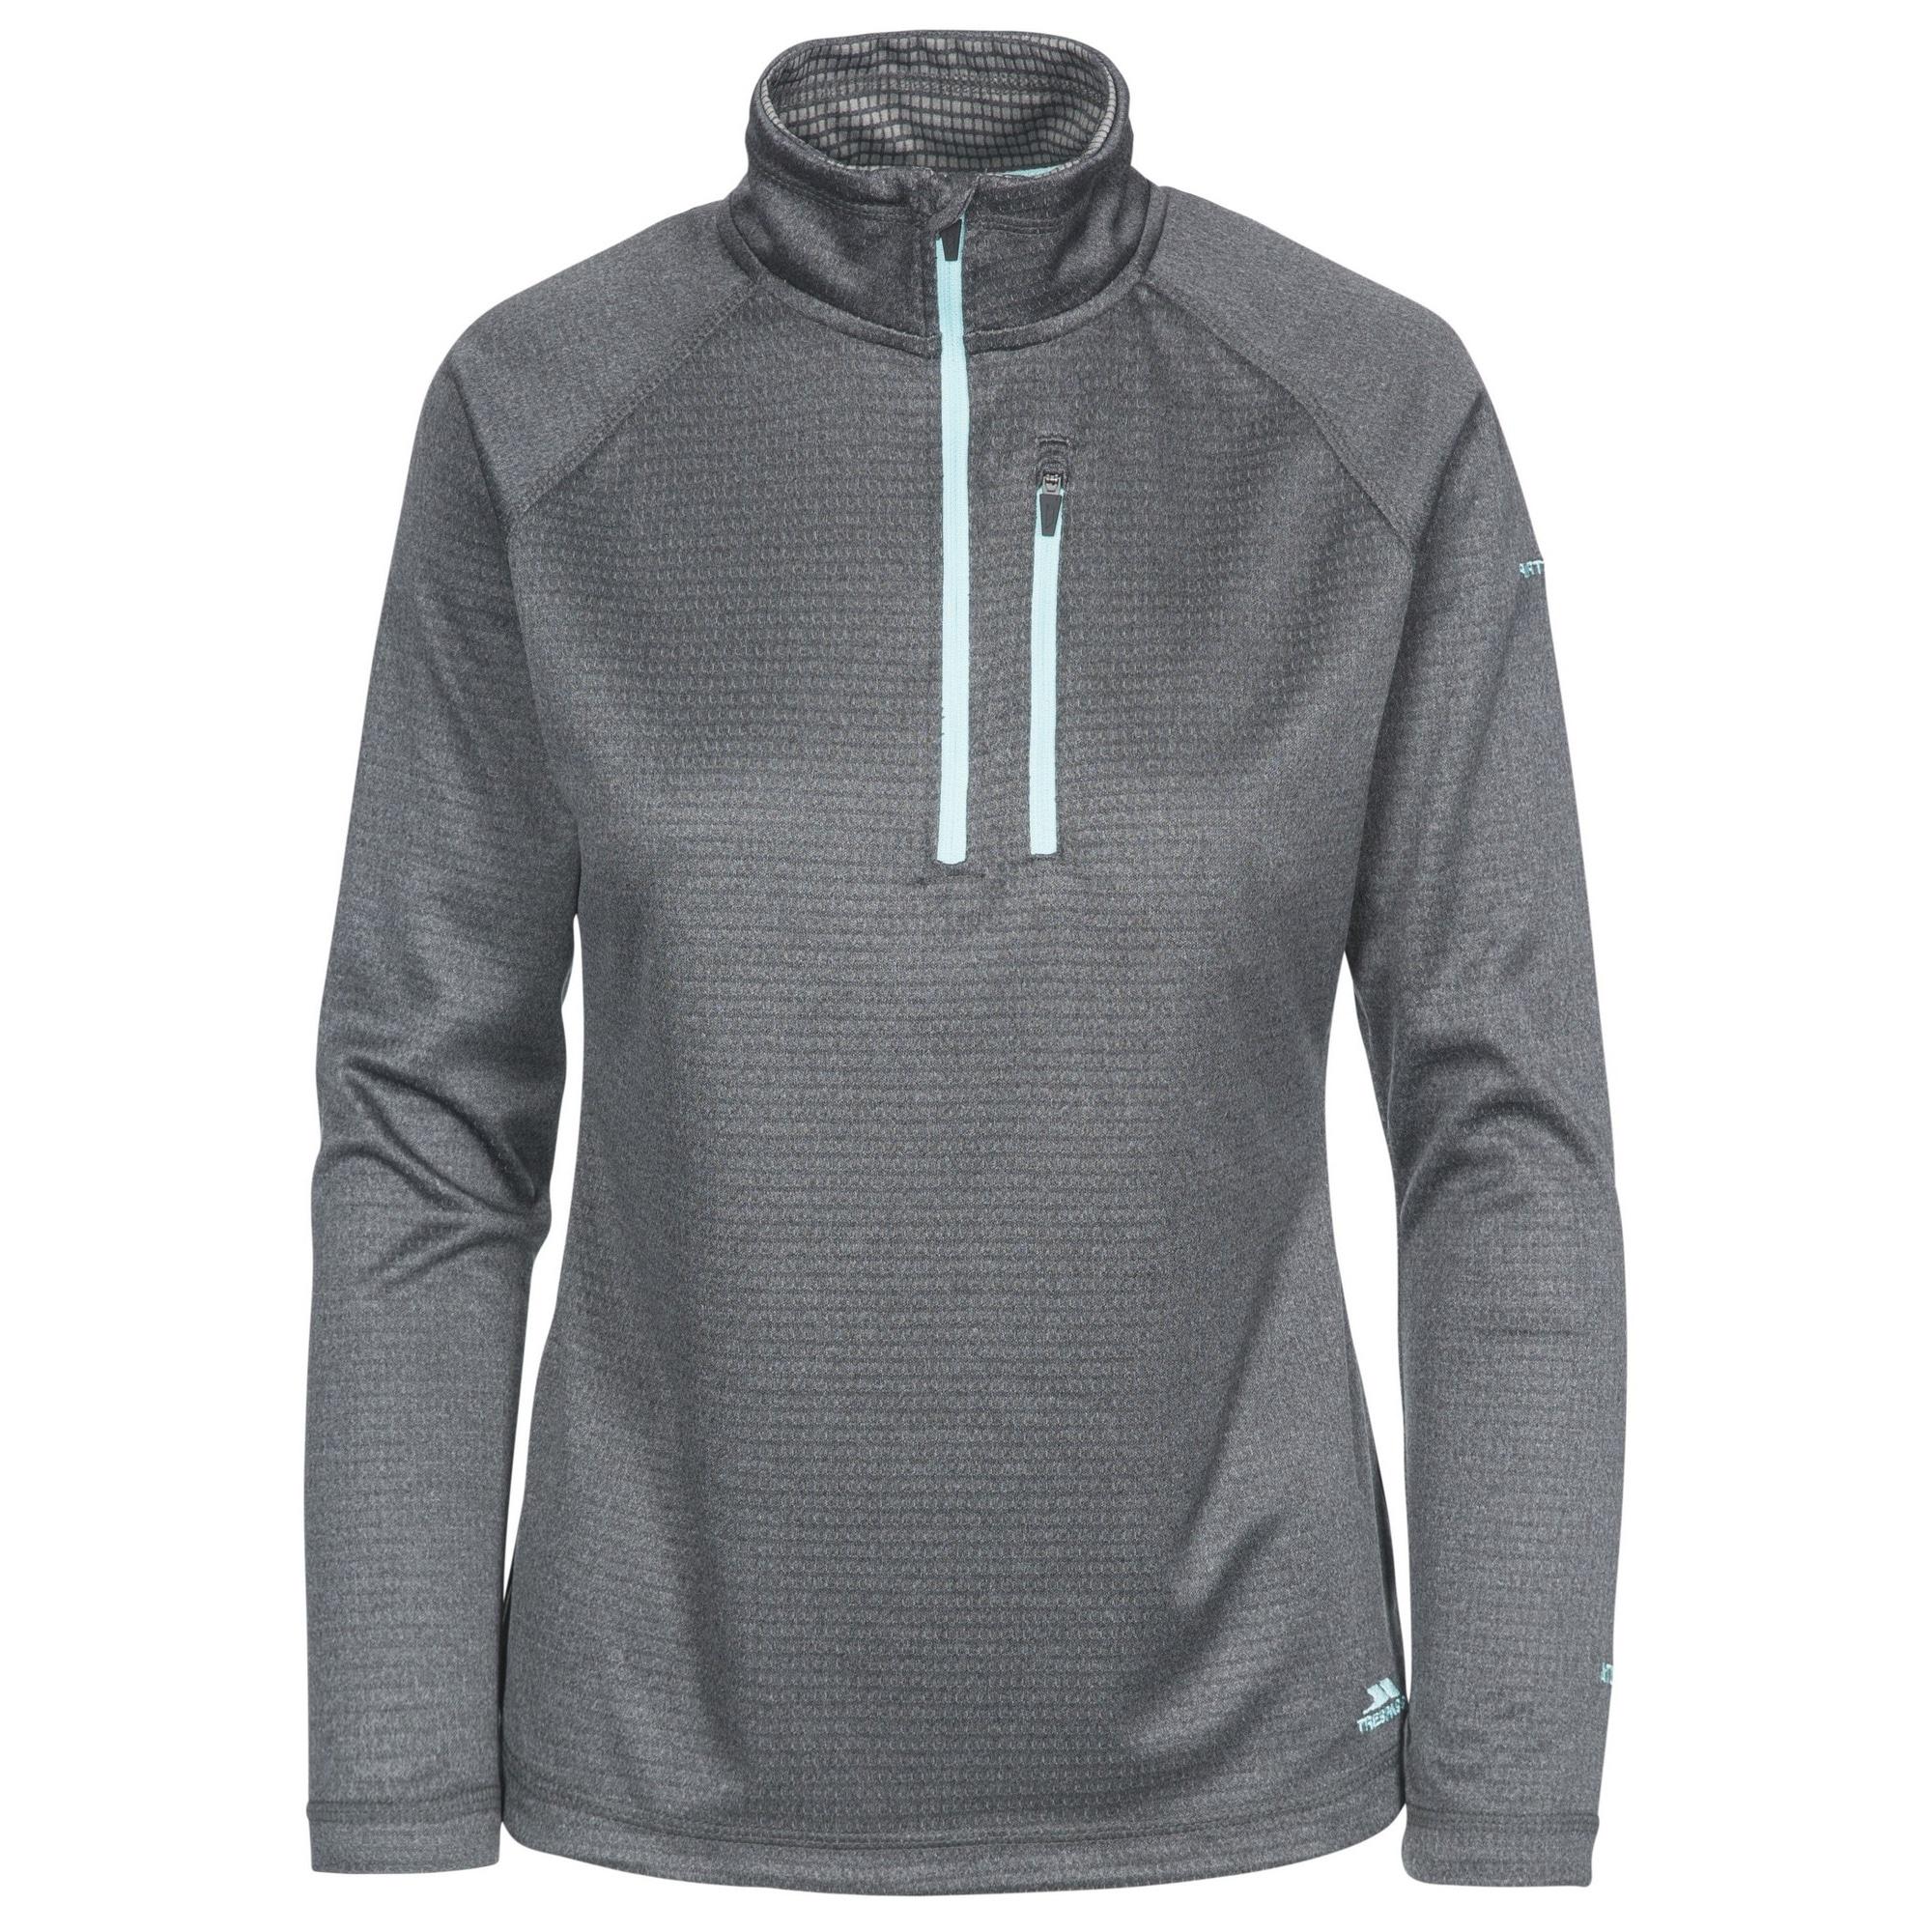 Trespass Fleeceshirt | Bekleidung > Sweatshirts & -jacken > Fleeceshirts | Grau | Trespass